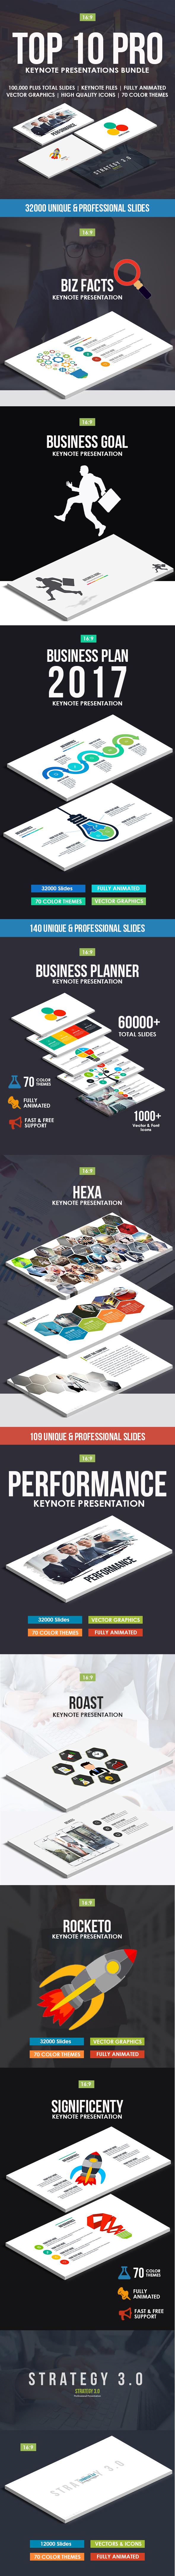 Top 10 IN 1 Pro Keynote Templates Bundle - Business Keynote Templates